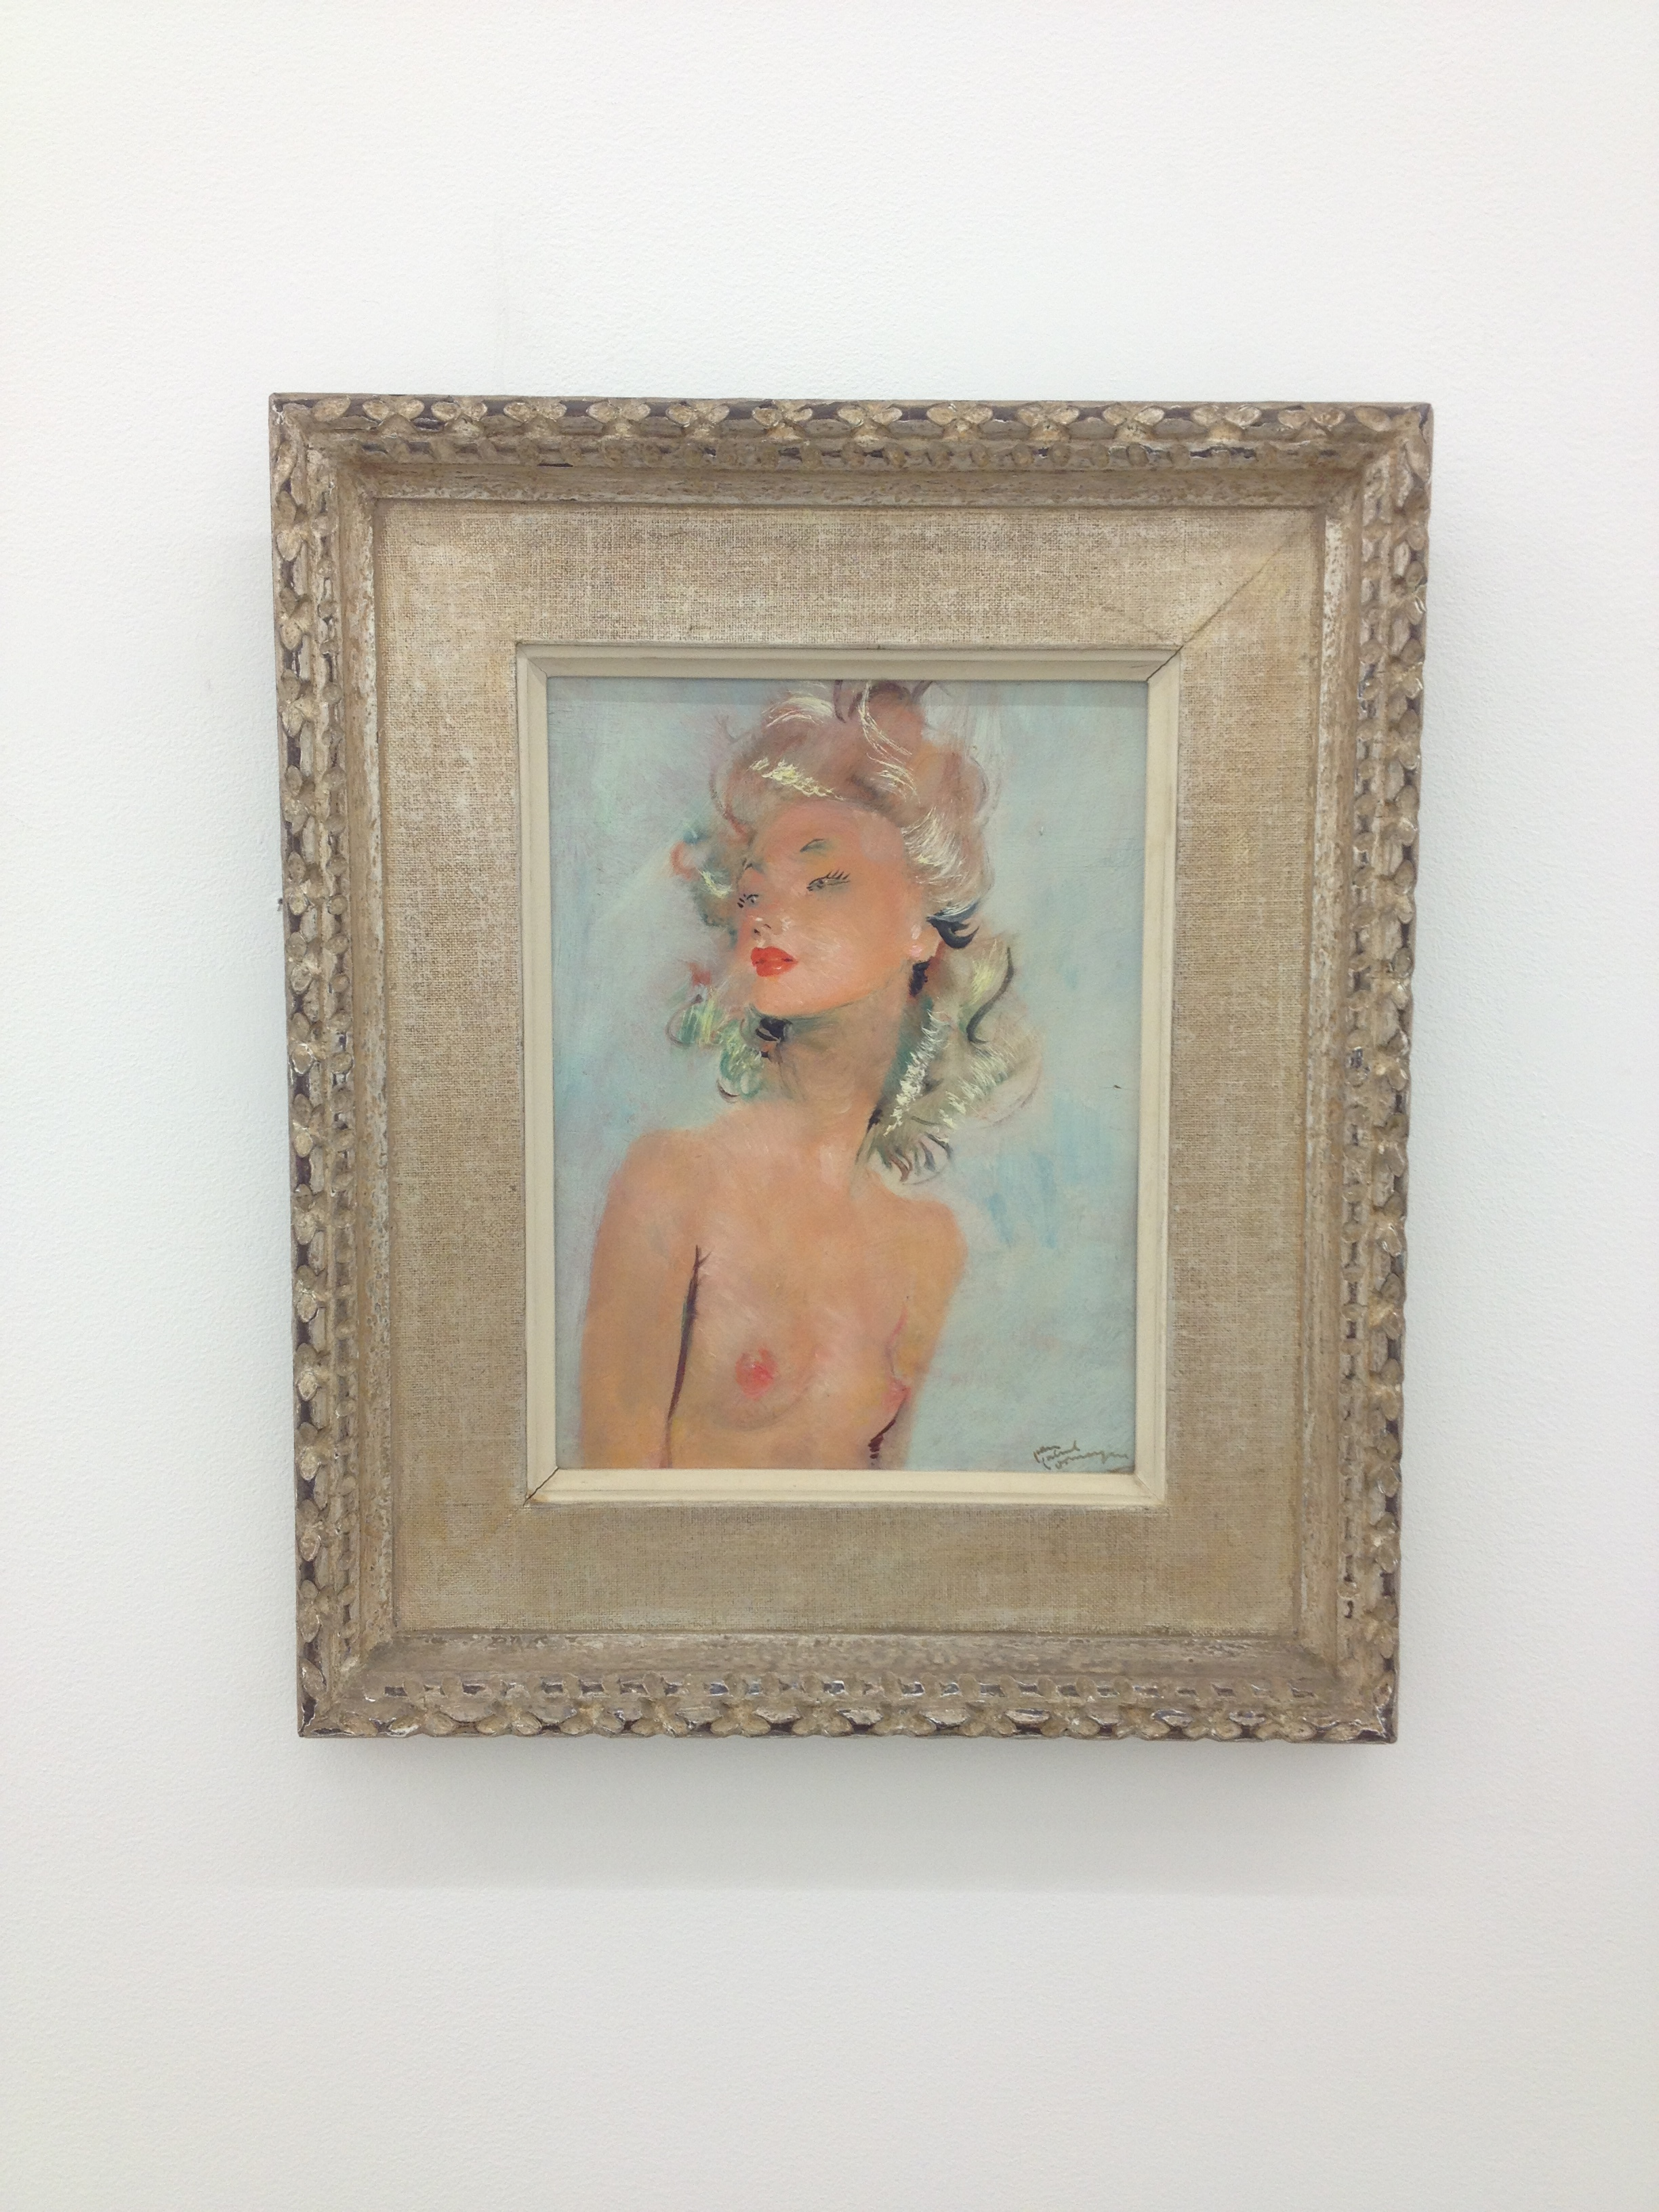 Jean-Gabriel Domergue, La Blonde, 1946 oil on wood 48,2 x 40,5 x 4 cm - 19 x 16 x 1 5/8 inches (framed)